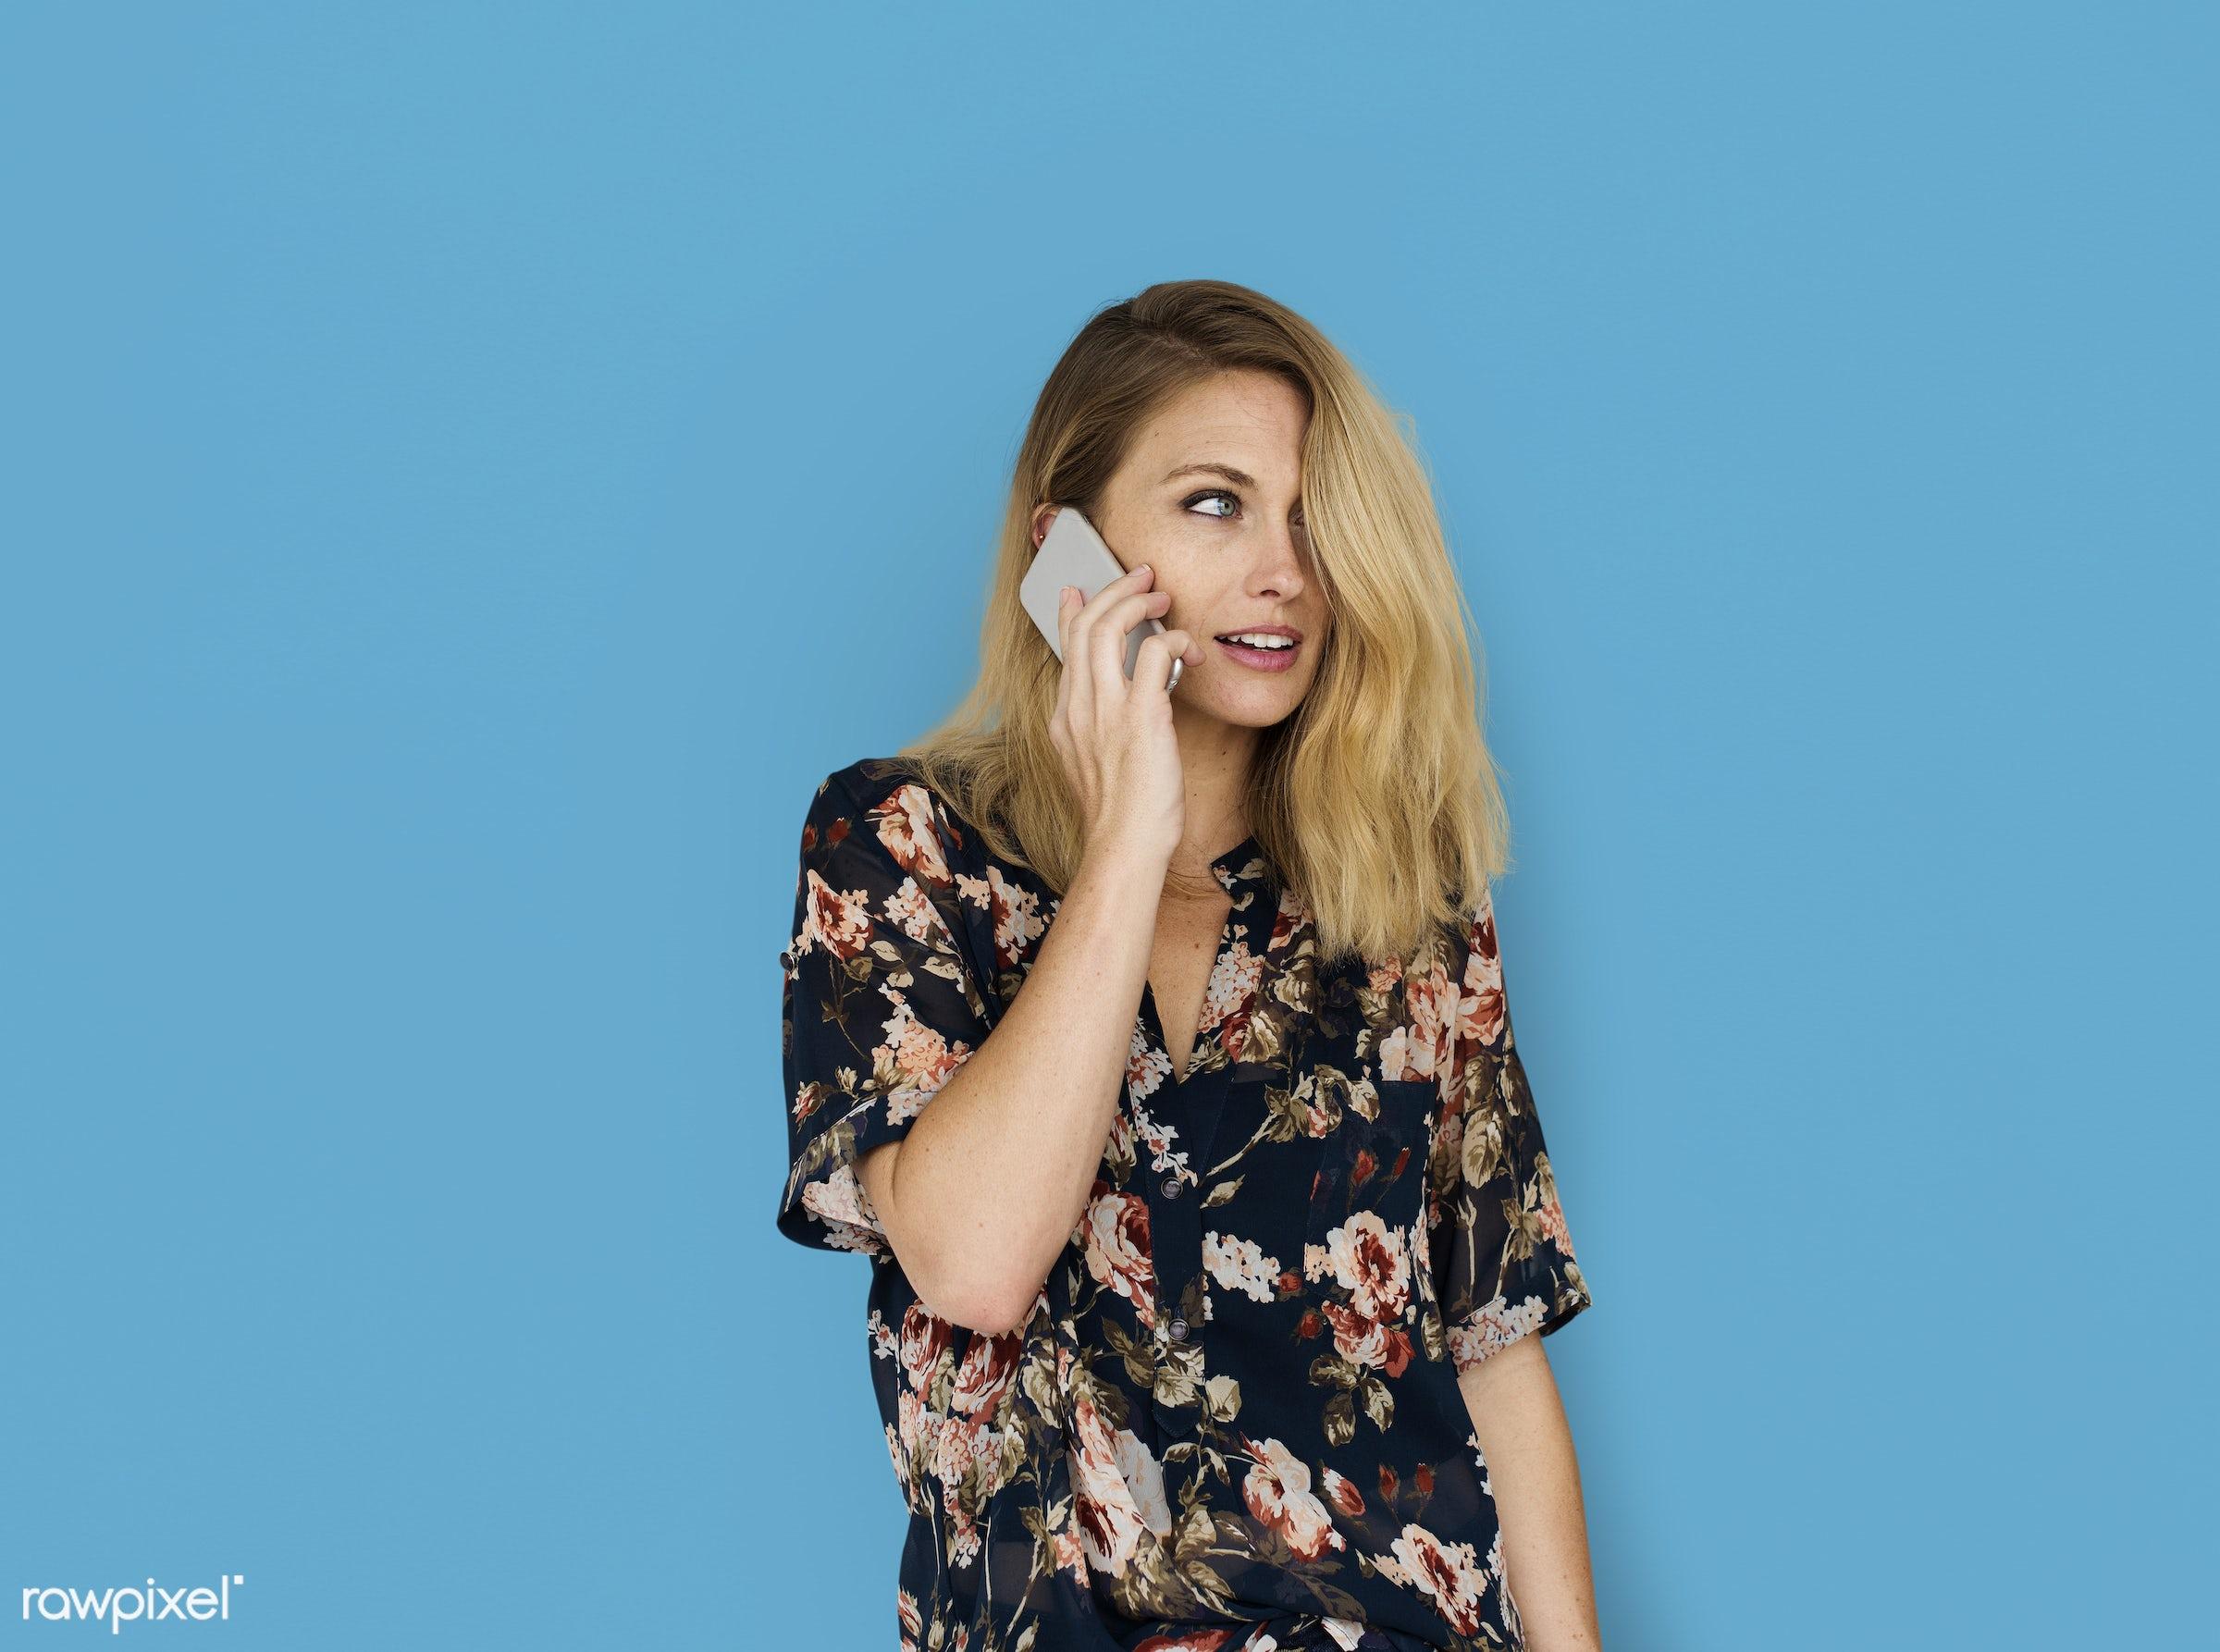 background, beauty, blue, brunette, casual, caucasian, charming, communication, connection, conversation, dealing,...